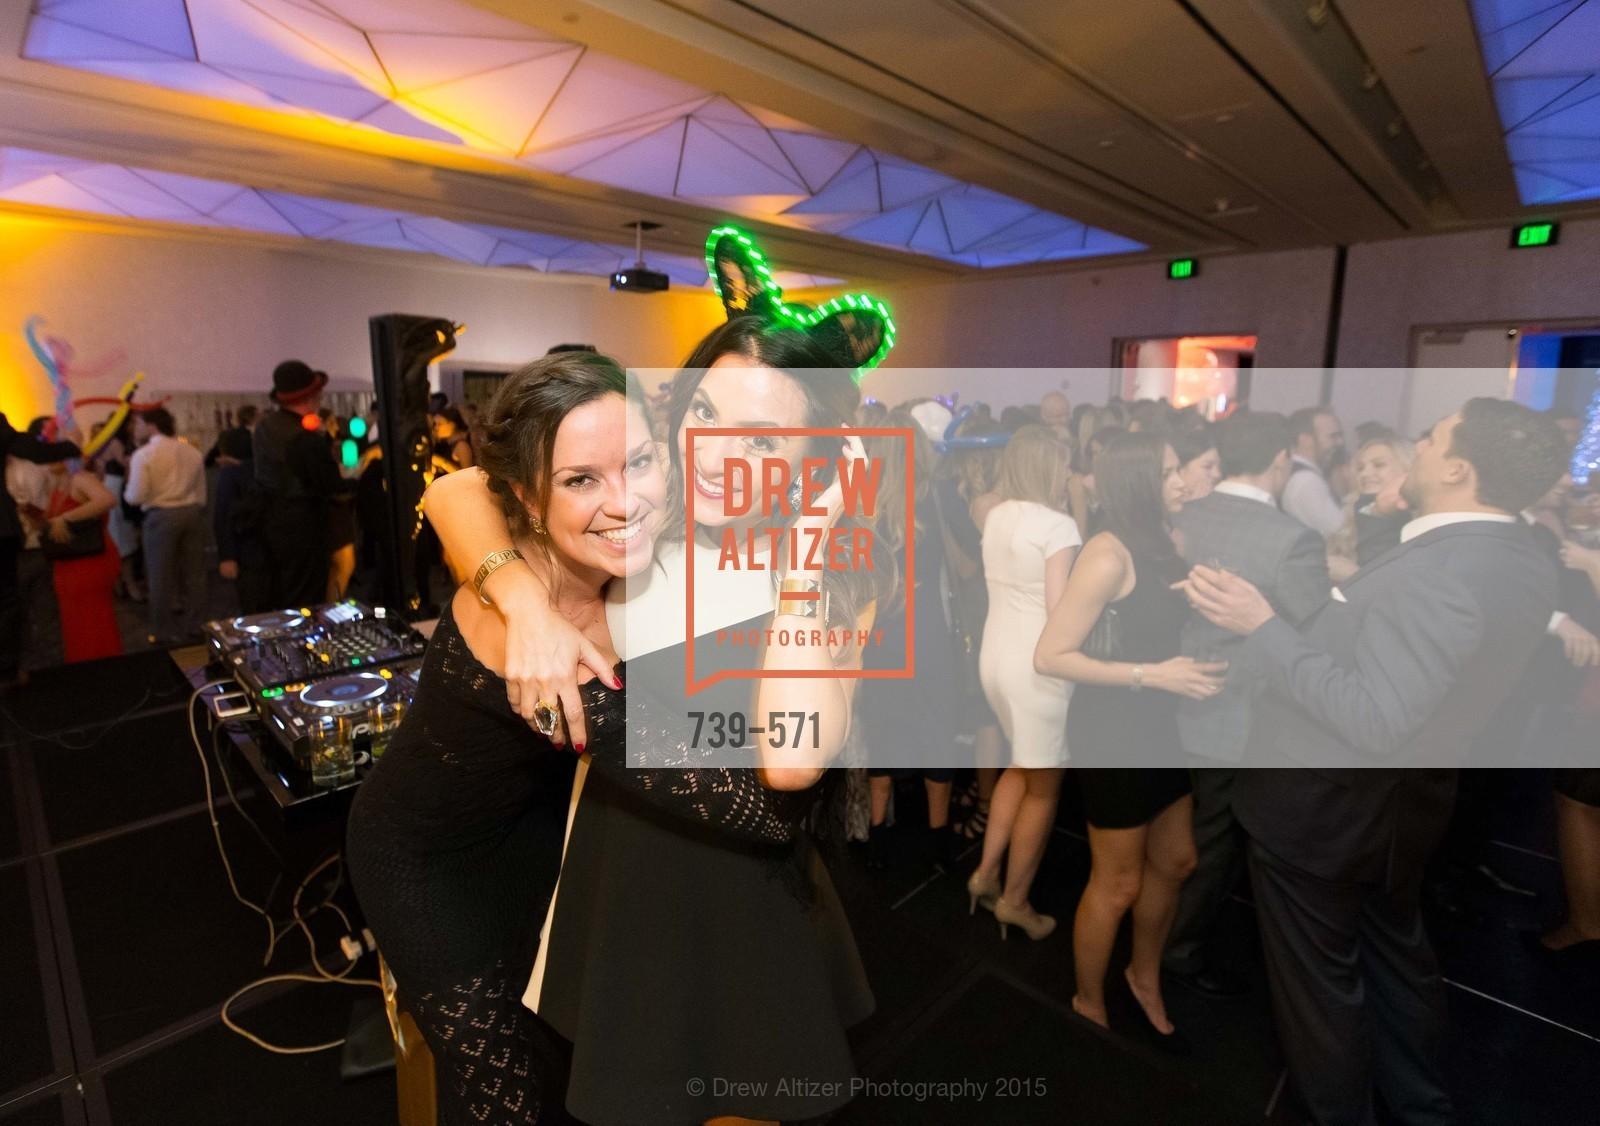 Hannah Schmunk, Alissa Yee, The 10th Annual San Francisco Social, W Hotel. 181 3rd St, November 21st, 2015,Drew Altizer, Drew Altizer Photography, full-service event agency, private events, San Francisco photographer, photographer California